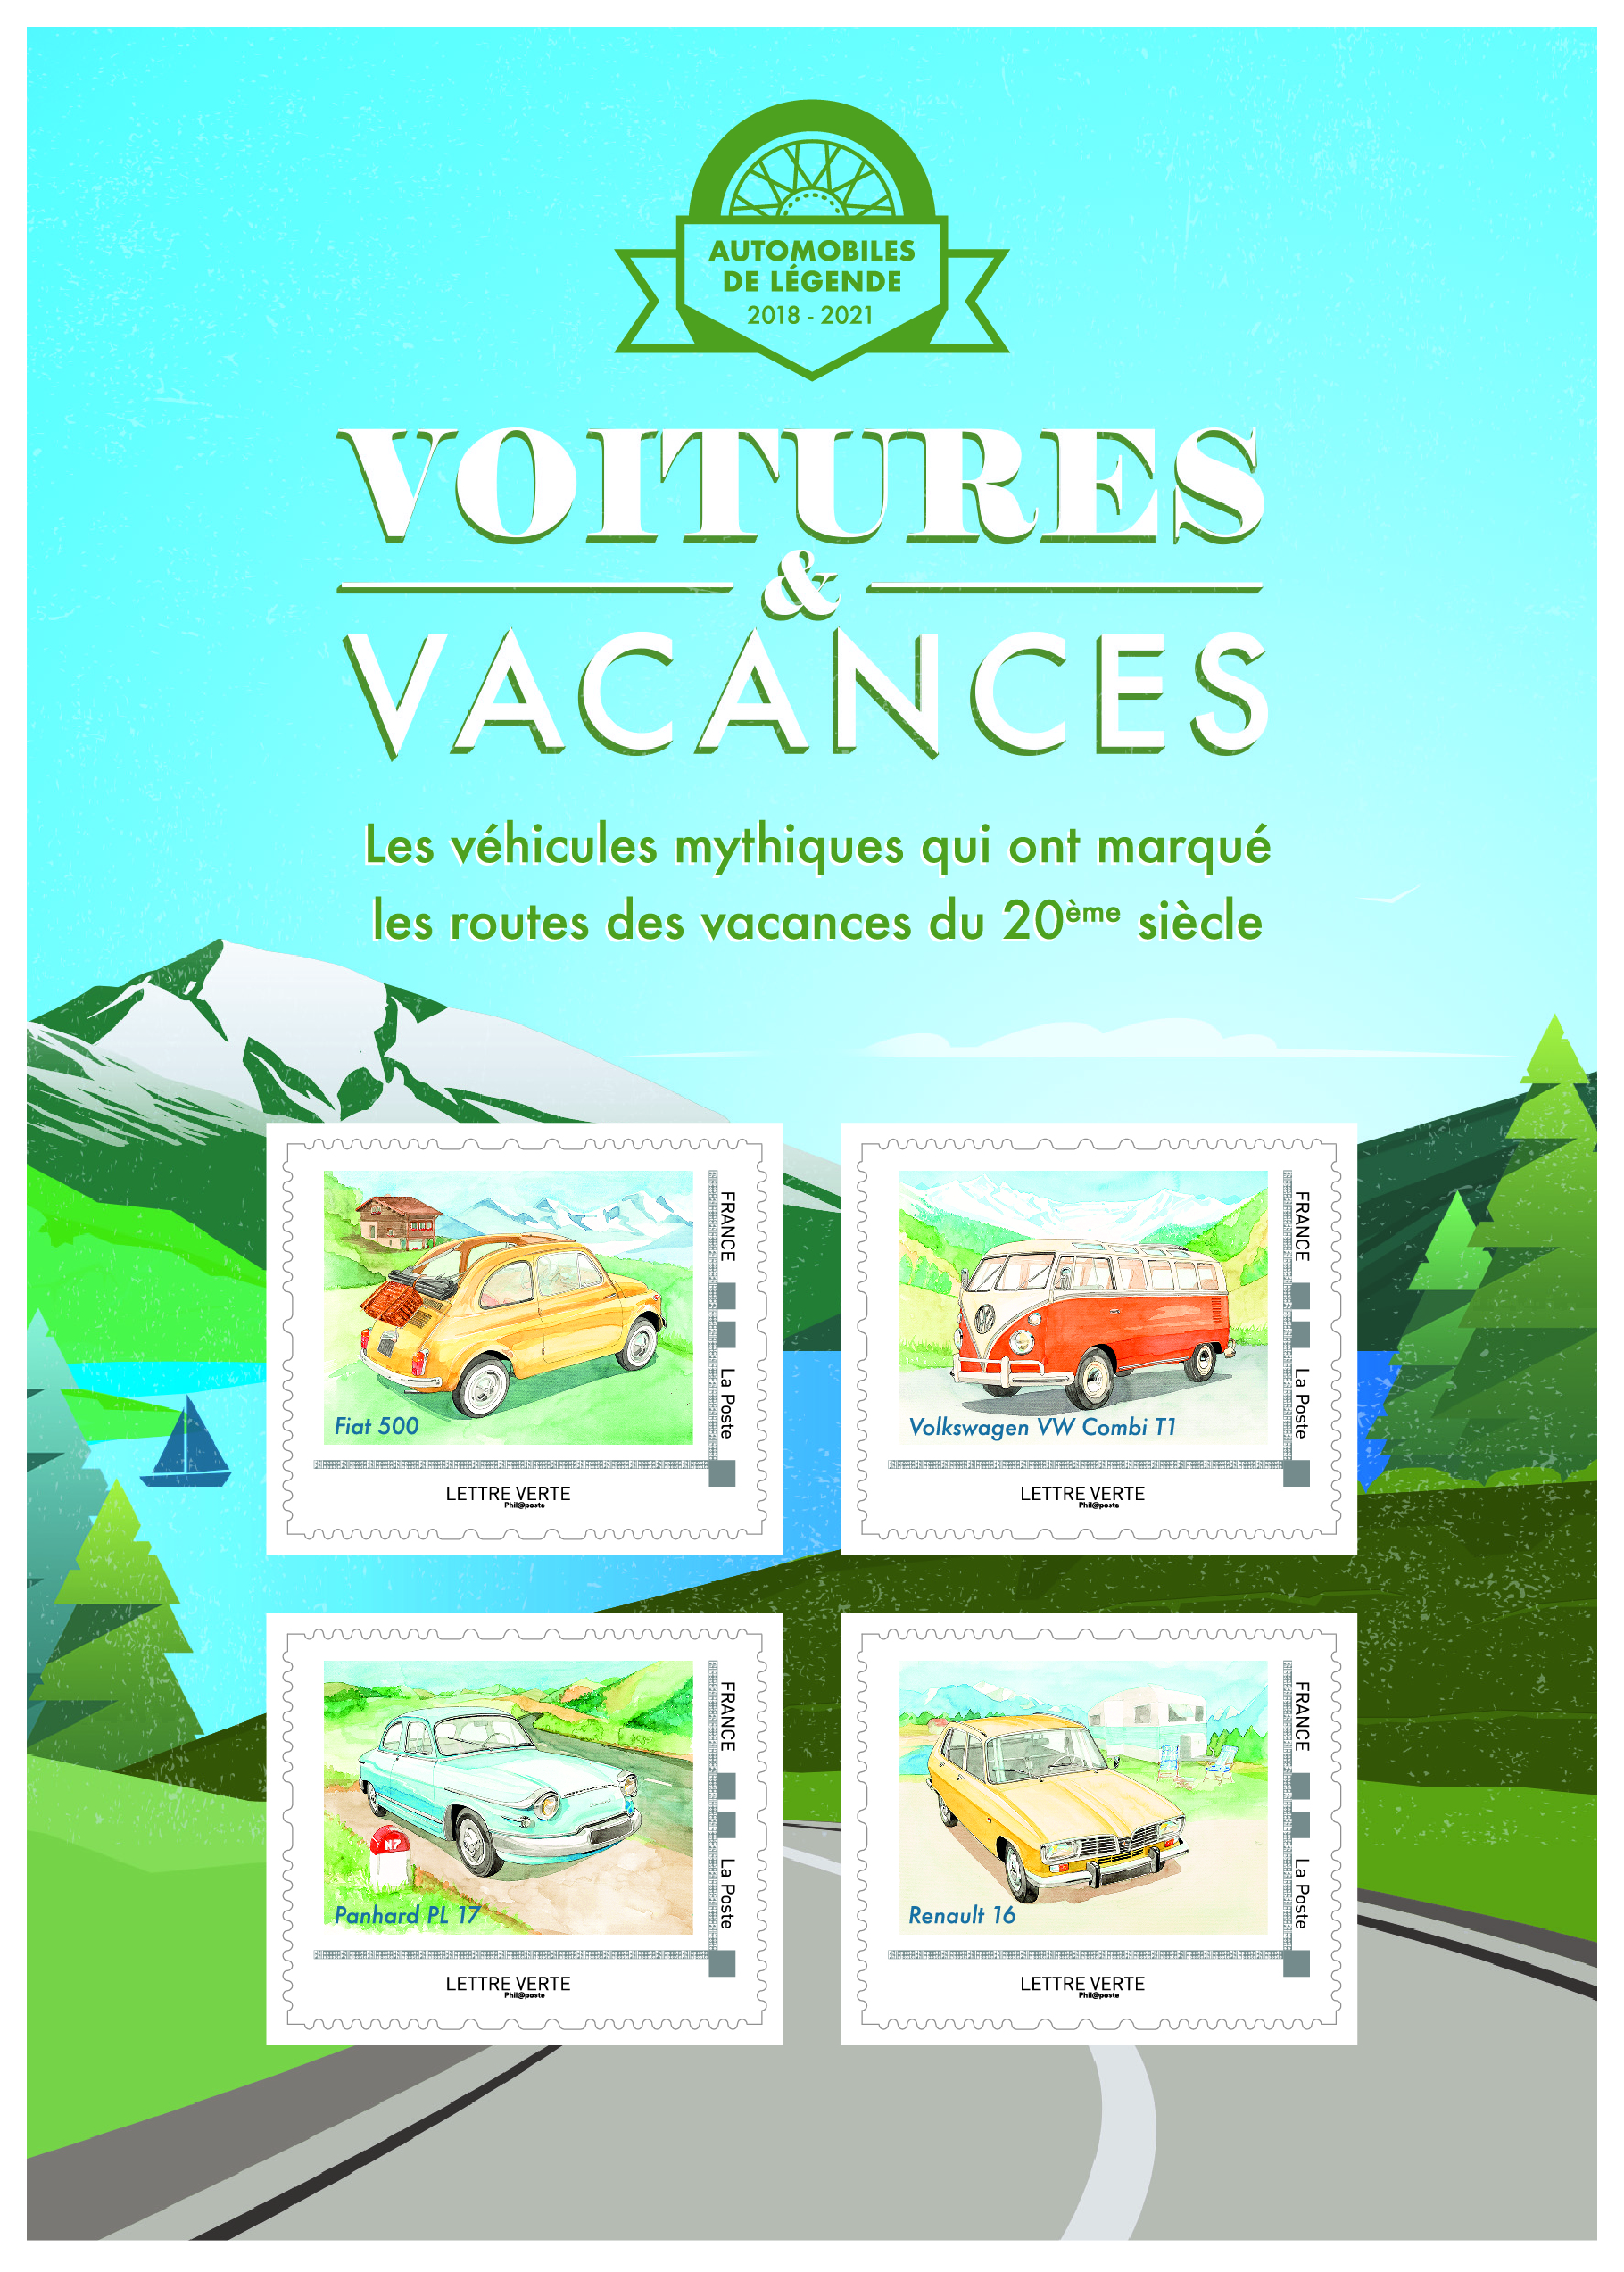 Collector Voitures & Vacances Montagne